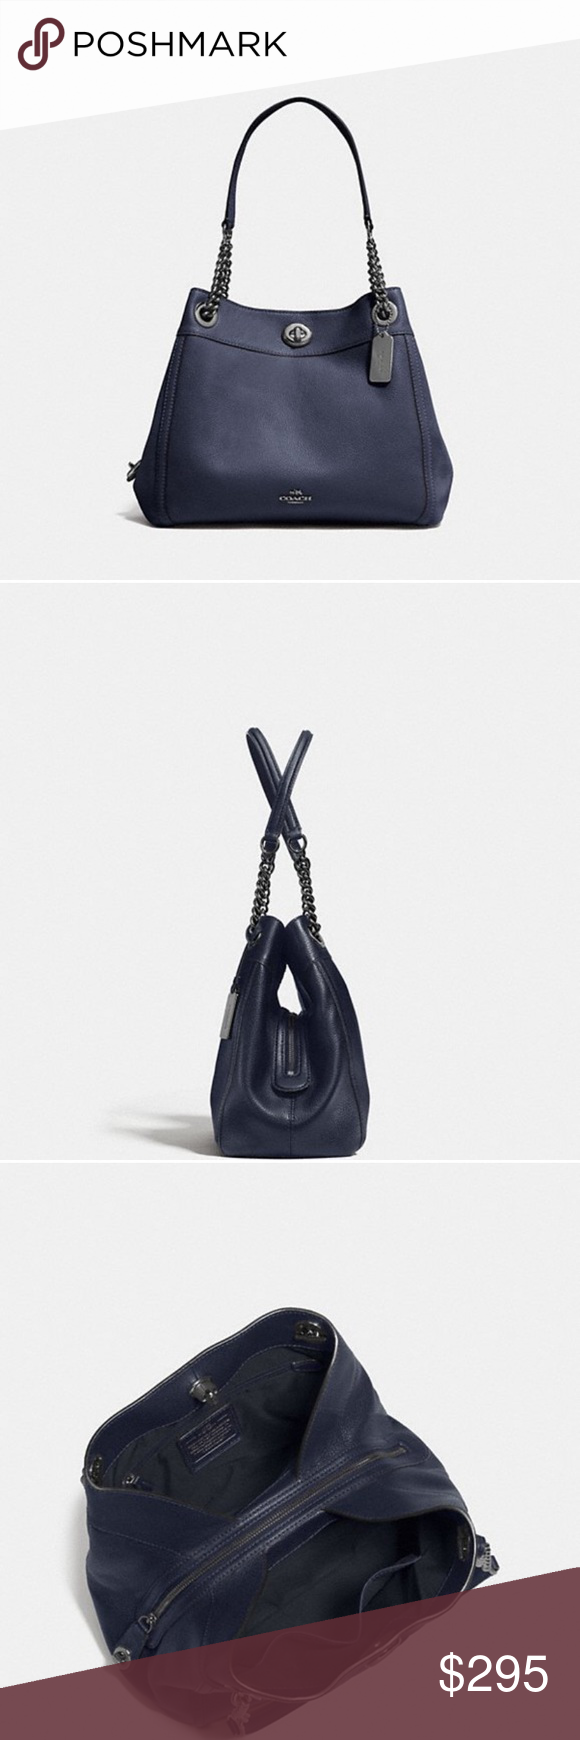 840dc33cfd42 COACH Turnlock Edie shoulder bag Beautiful pebble polished leather in navy  blue. Inside zip